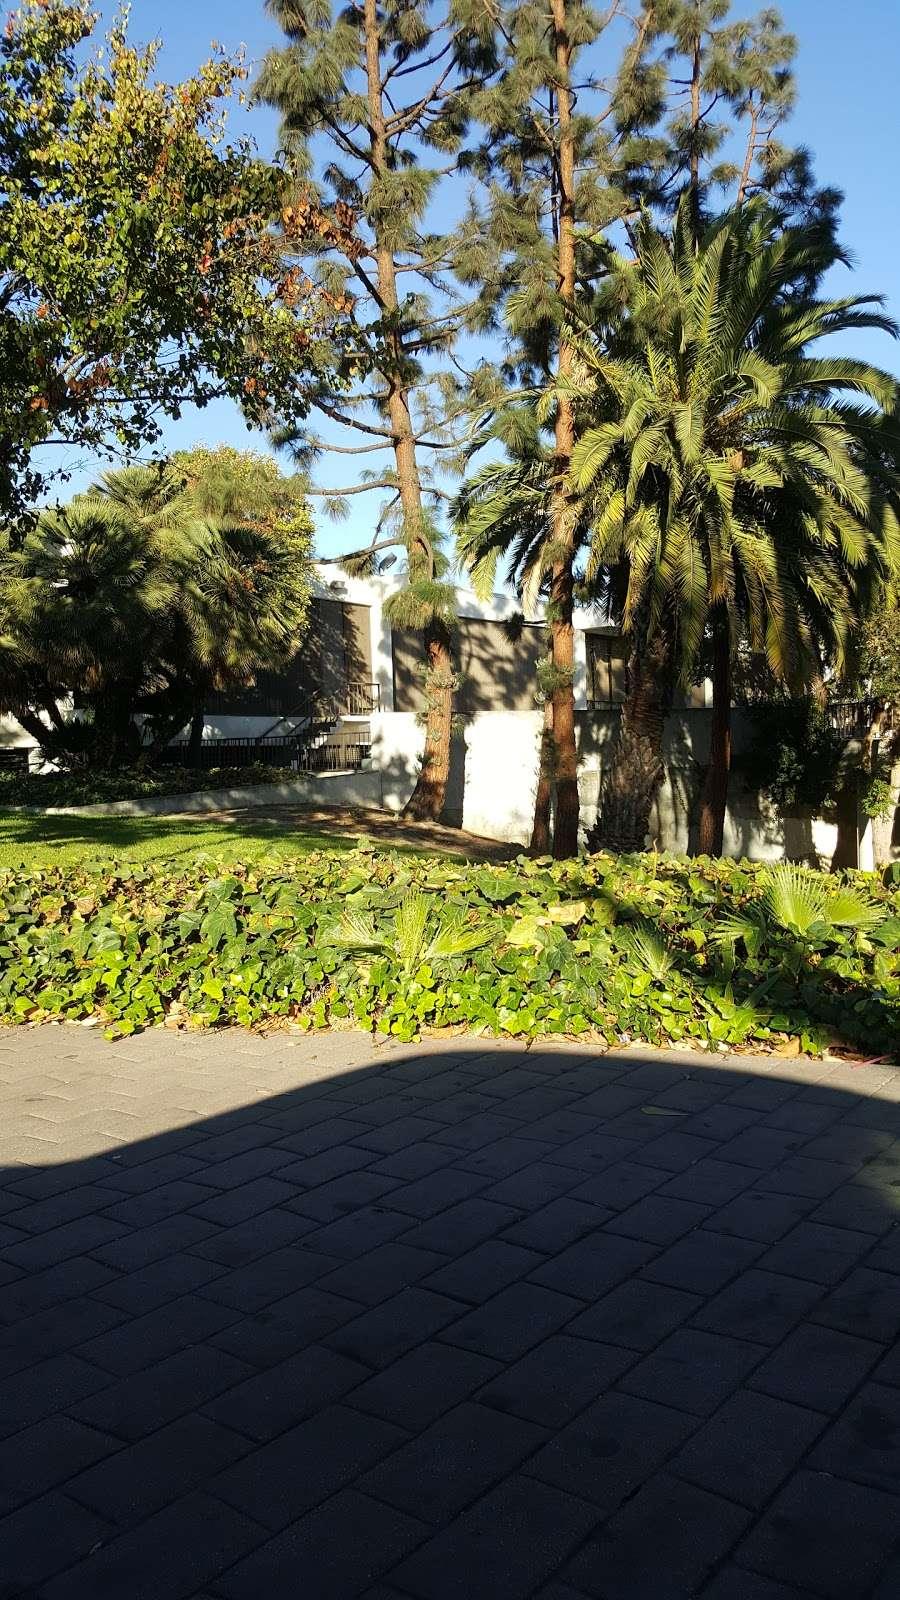 Compton Courthouse - courthouse  | Photo 4 of 10 | Address: 200 W Compton Blvd, Compton, CA 90220, USA | Phone: (310) 605-4065